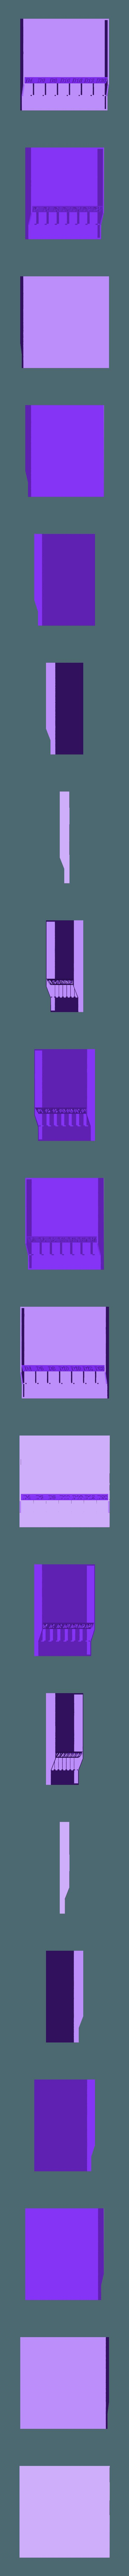 DD_Tray_Rentz_JB_v2.stl Download free STL file D&D Dice Tray - Labeled Dice Remix • 3D printer template, jonbourg